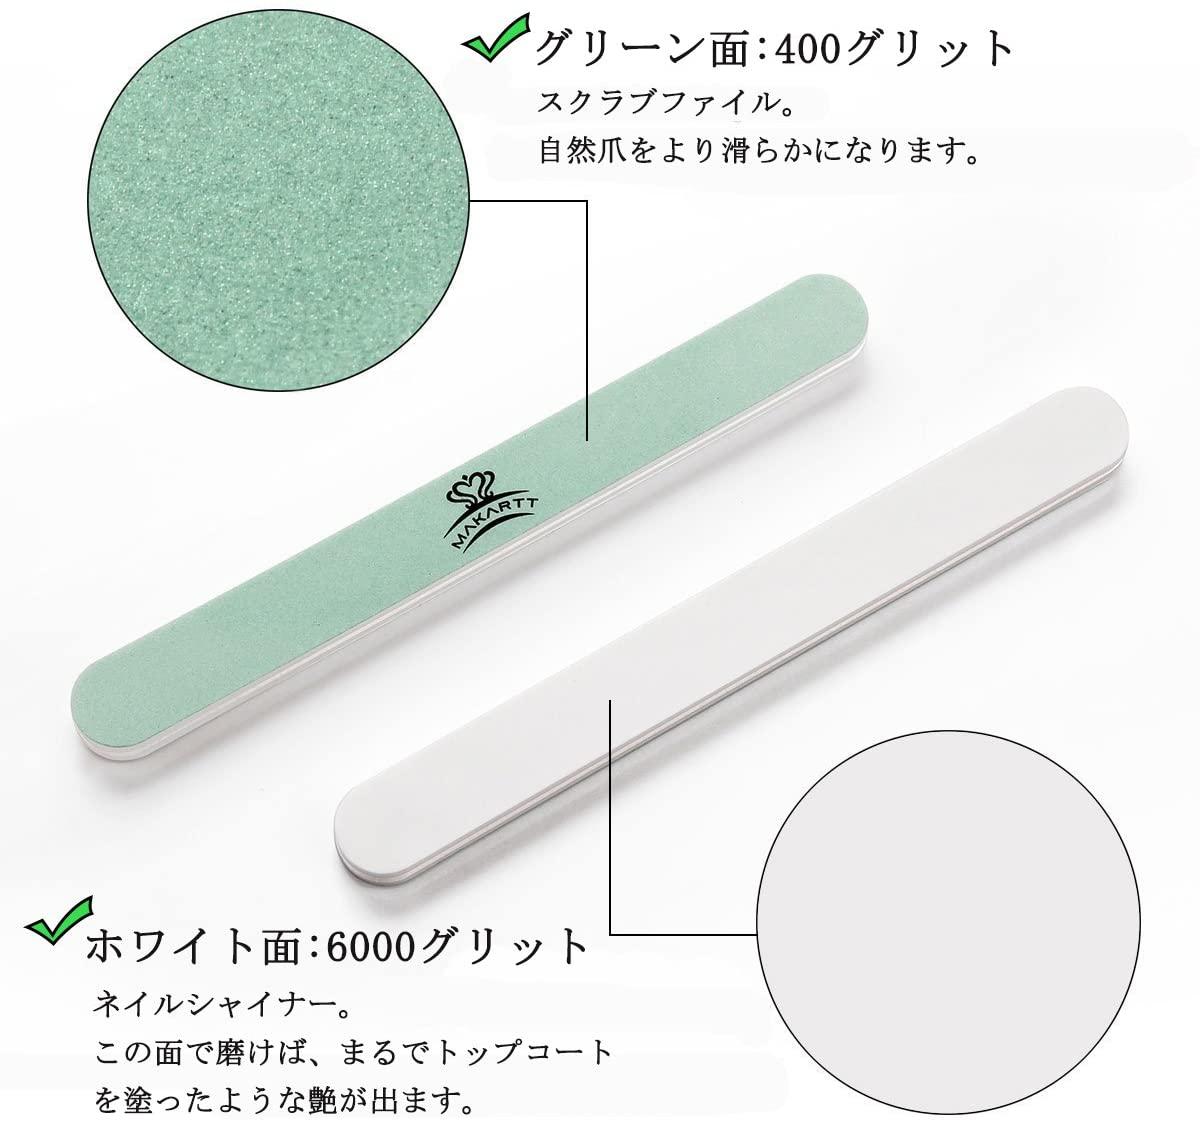 Makartt(マカート) バッファー 爪 磨き ネイルシャイナー 10本入の商品画像4